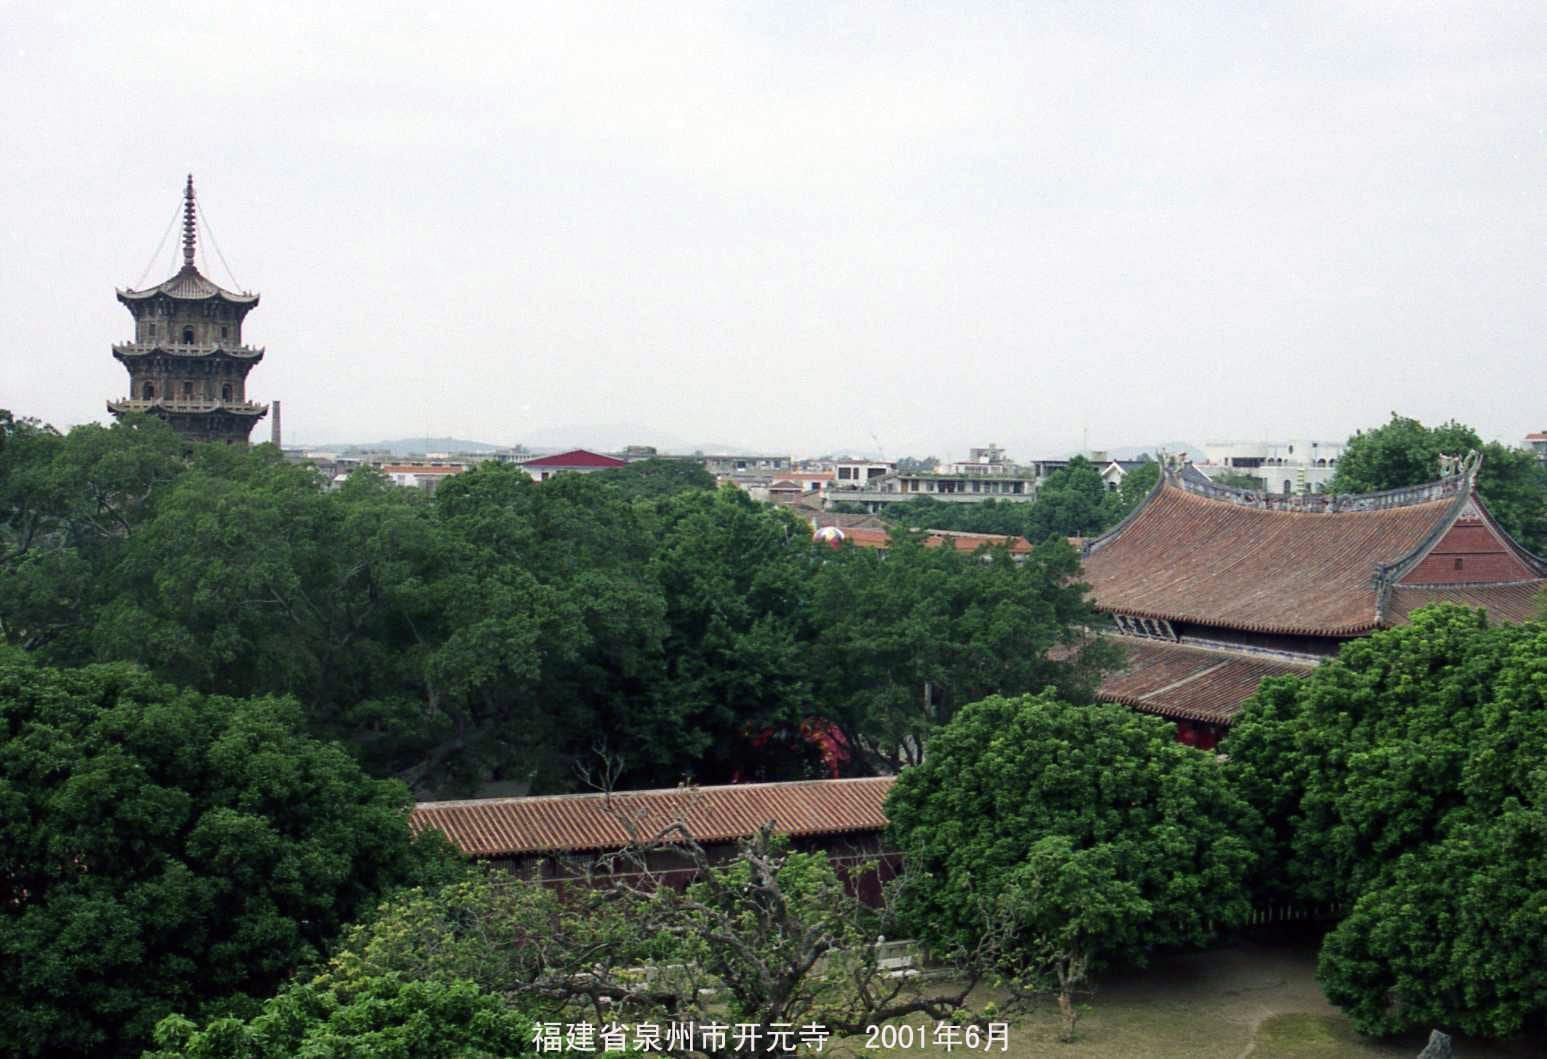 En los terrenos del Templo Kaiyuan Quanzhou China